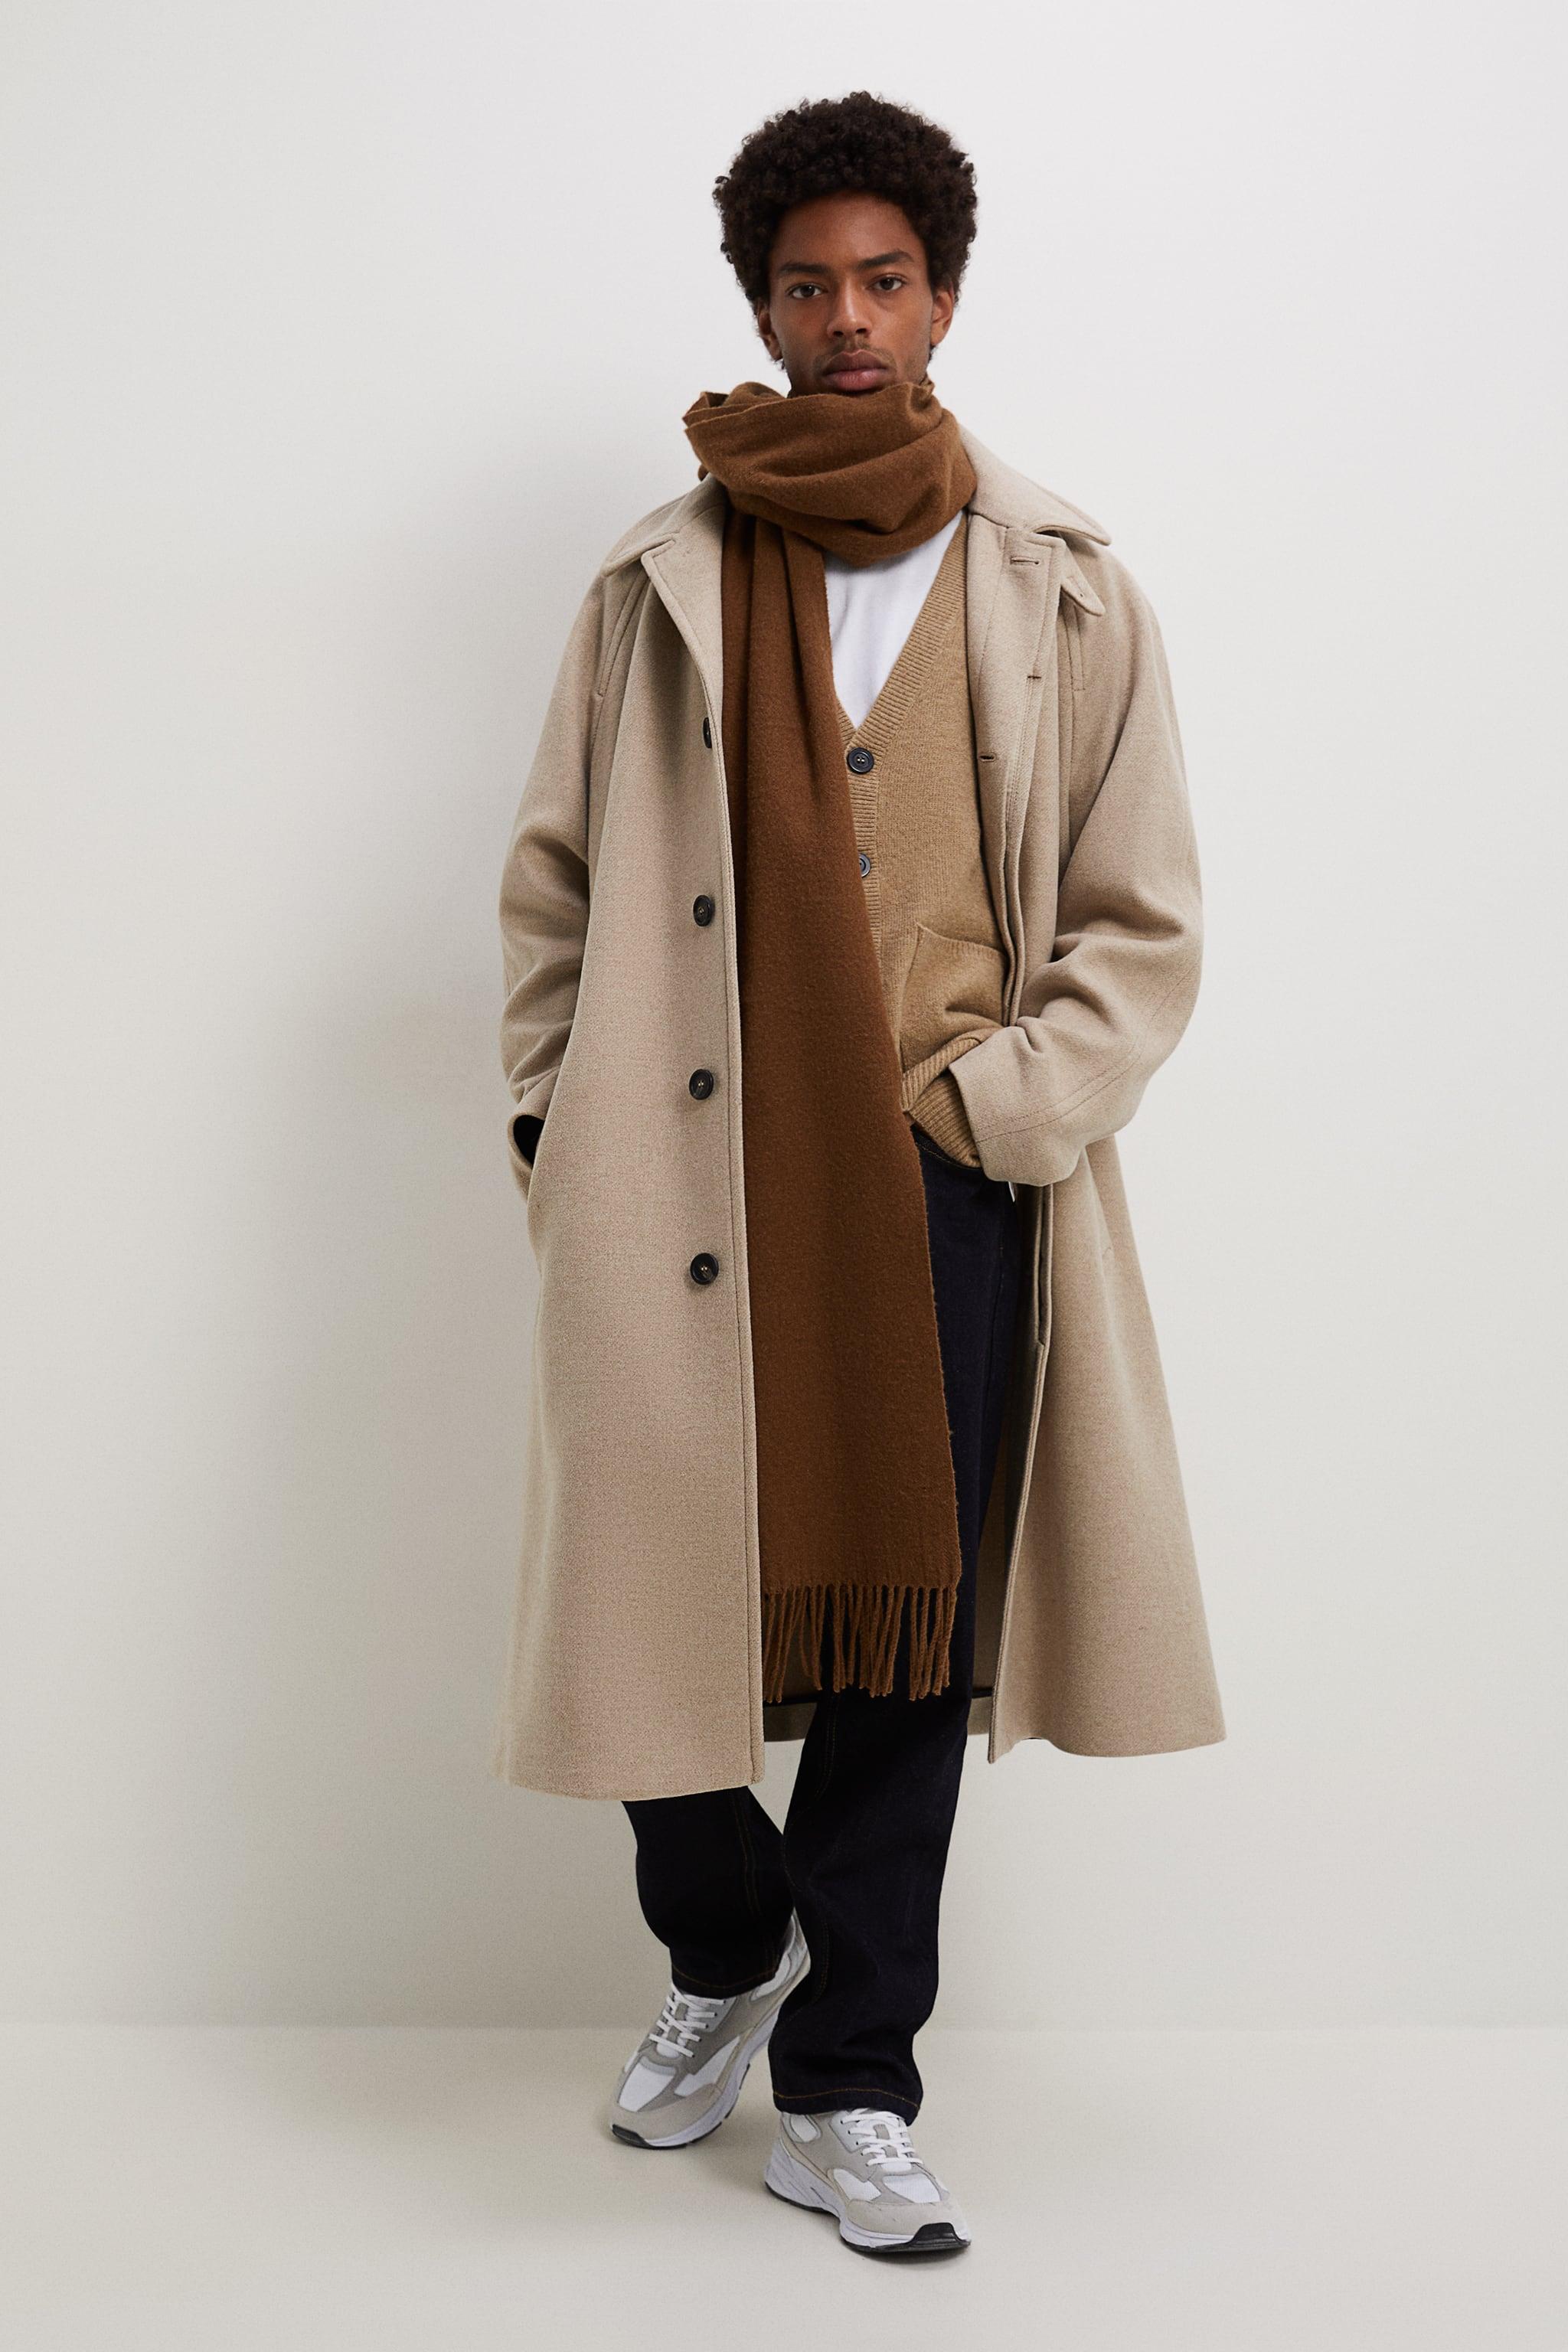 Zara TEXTURED WEAVE COAT